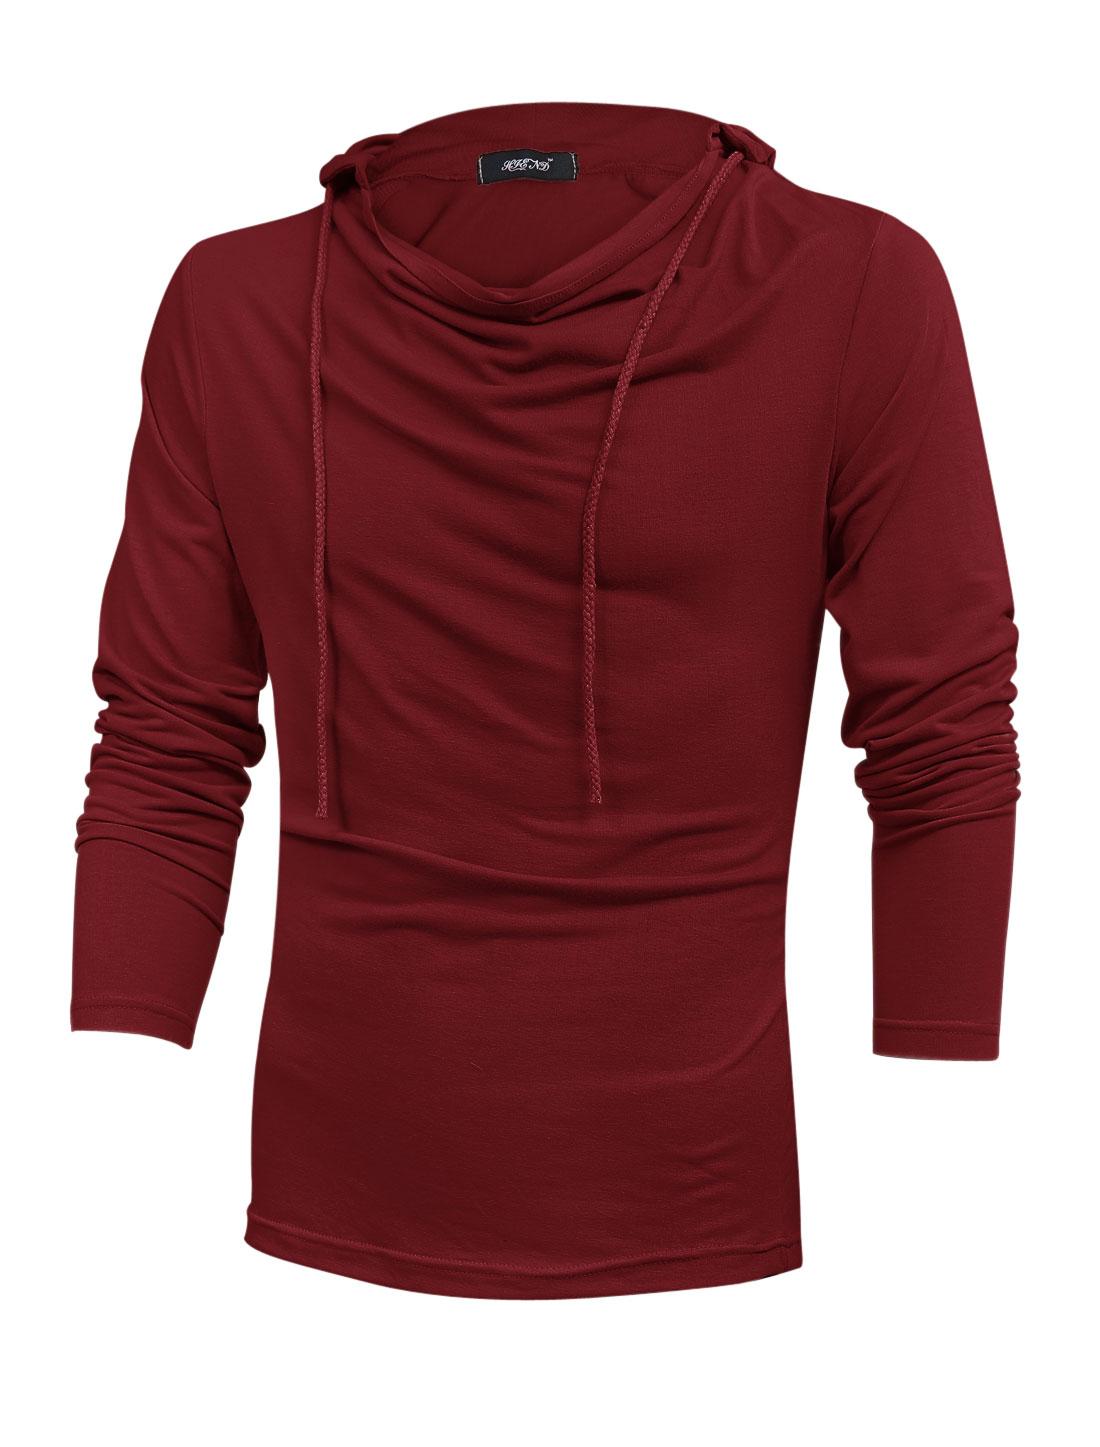 Drawstring Hooded Fashionable Sweatshirt for Men Burgundy M